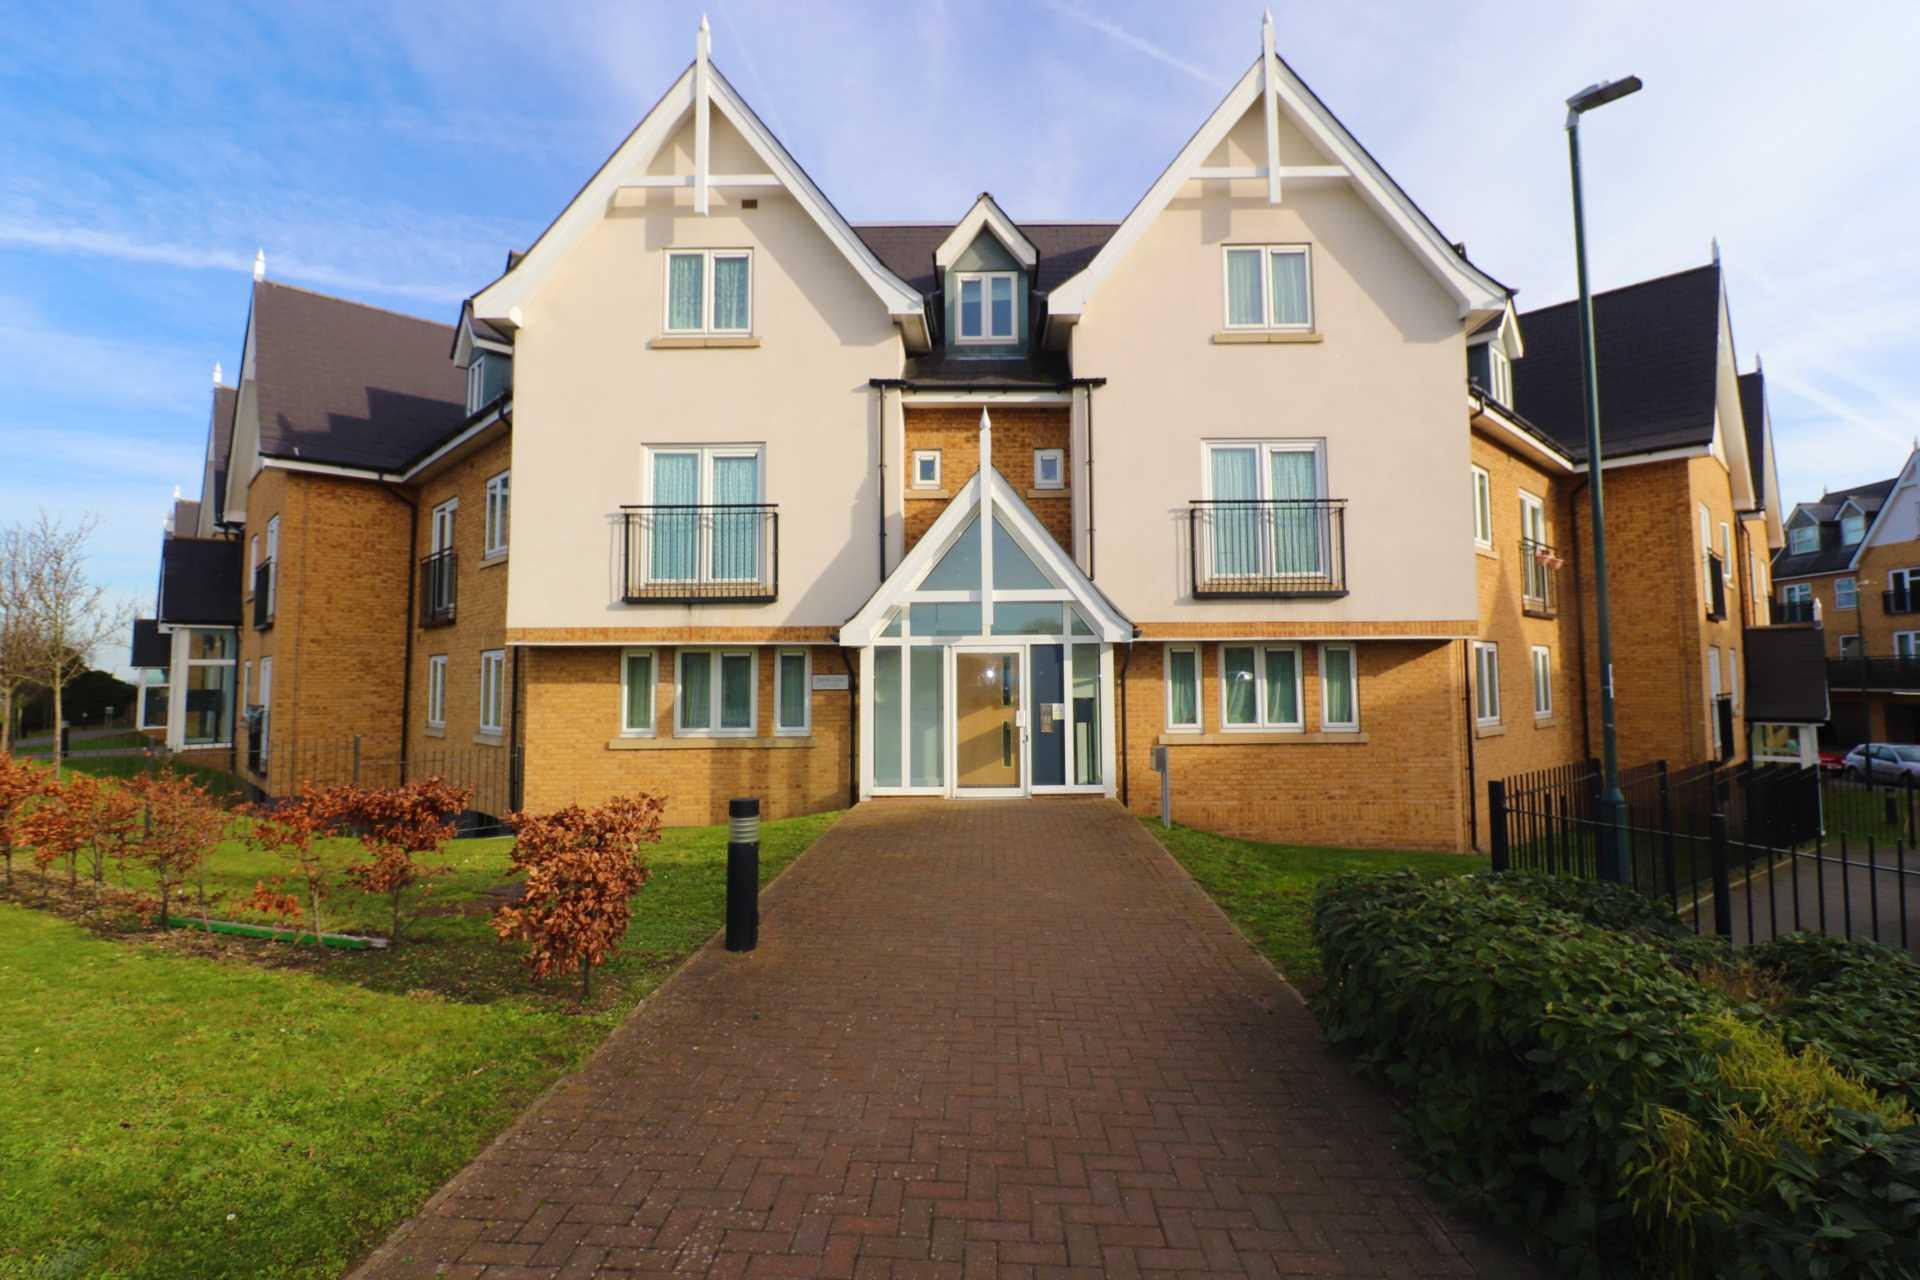 Property King Estate Agents - 2 Bedroom Apartment, Tanner Close, Dartford